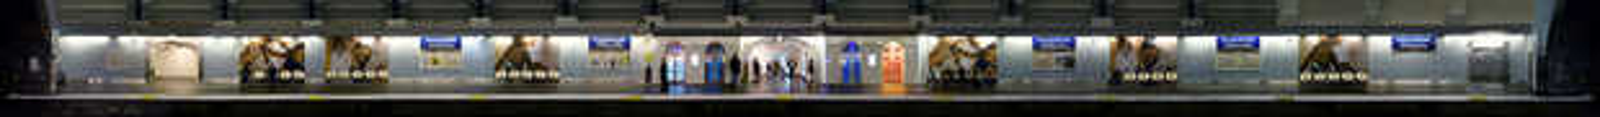 Champs-Elysees Clemenceau - Larry Yust